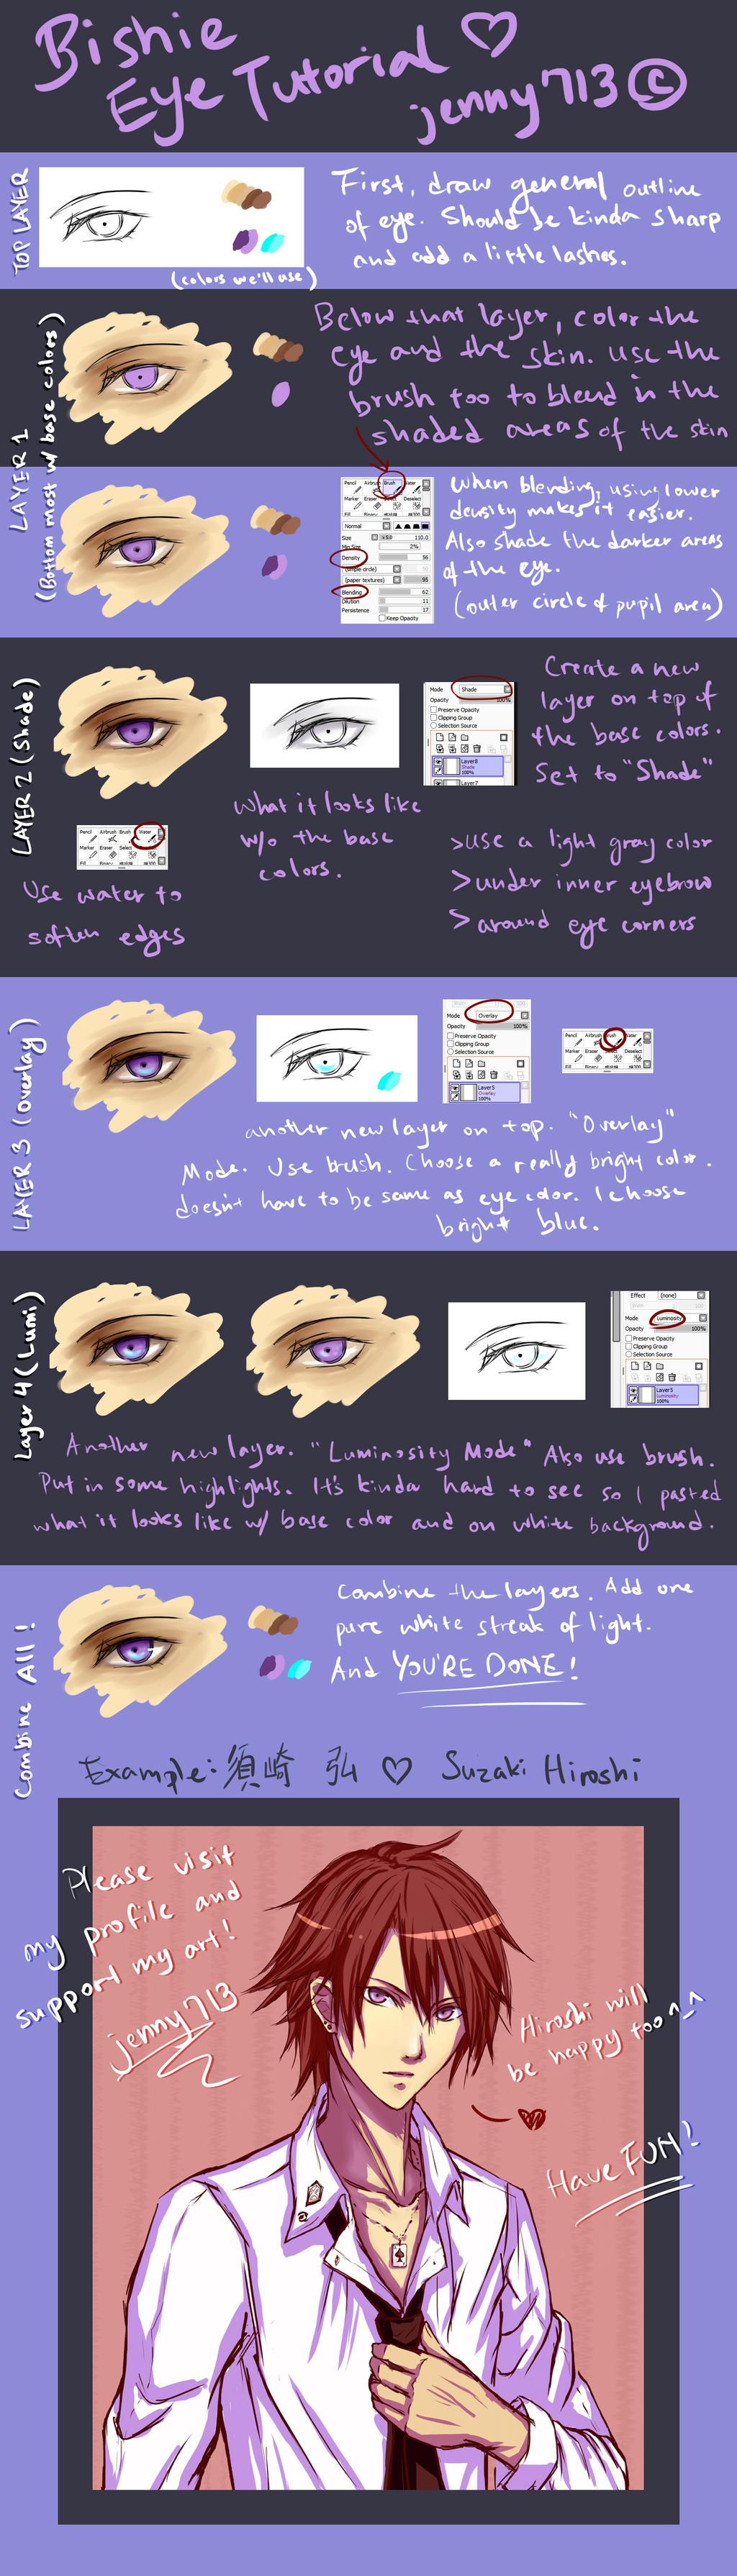 Tutorial paint tool sai bishie anime male eye by naisei on tutorial paint tool sai bishie anime male eye by naisei ccuart Images